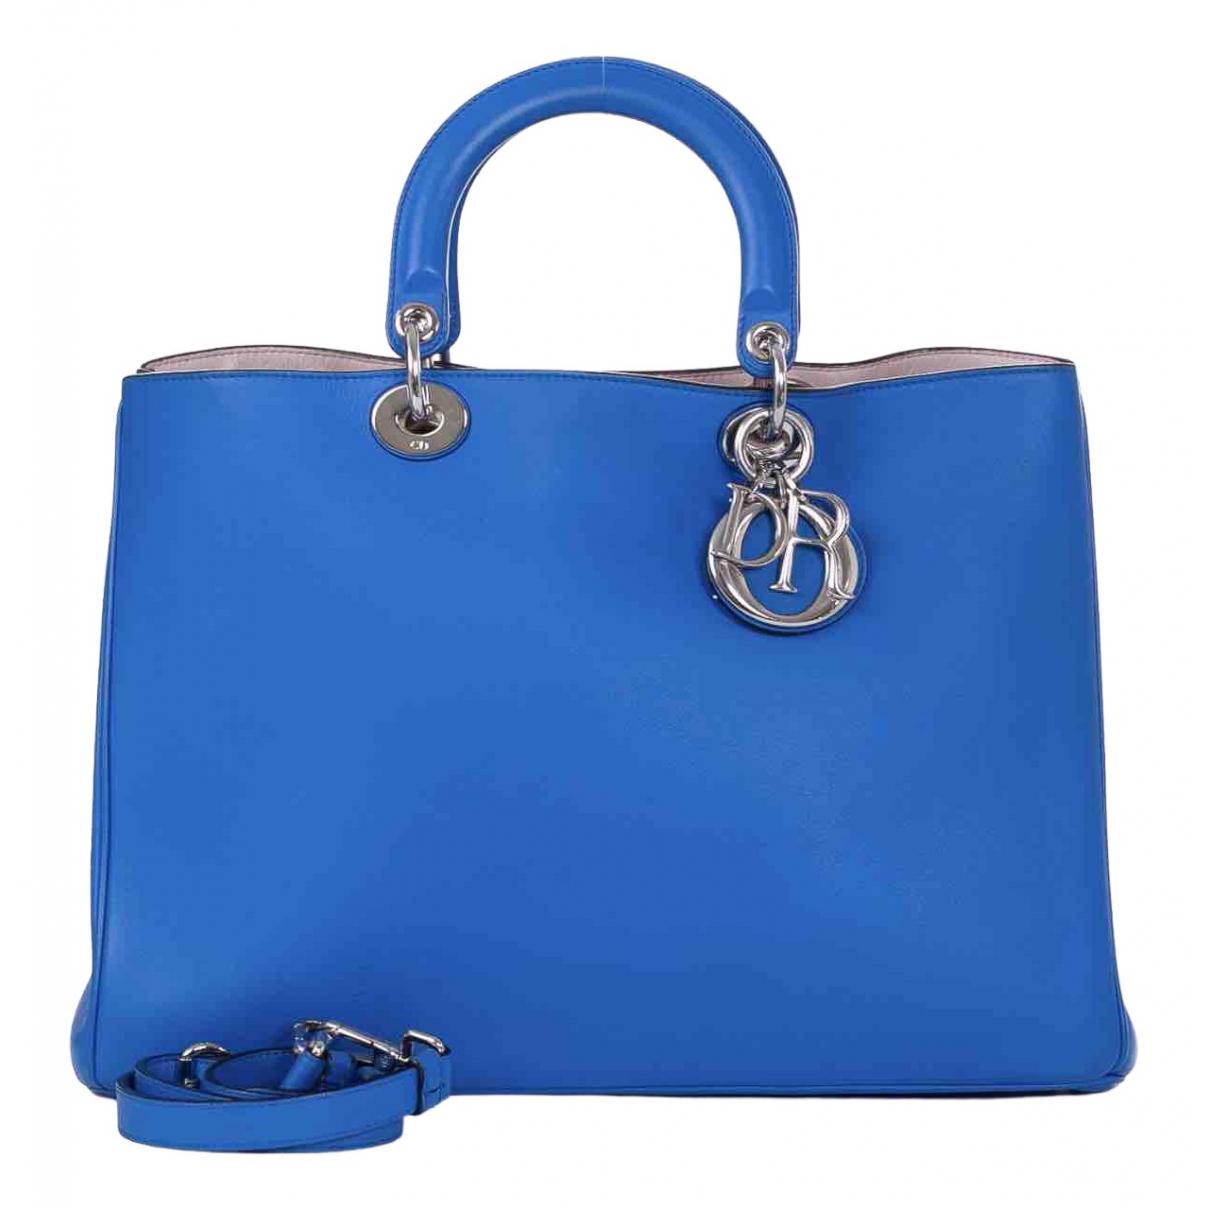 Dior \N Handtasche in  Bunt Leder